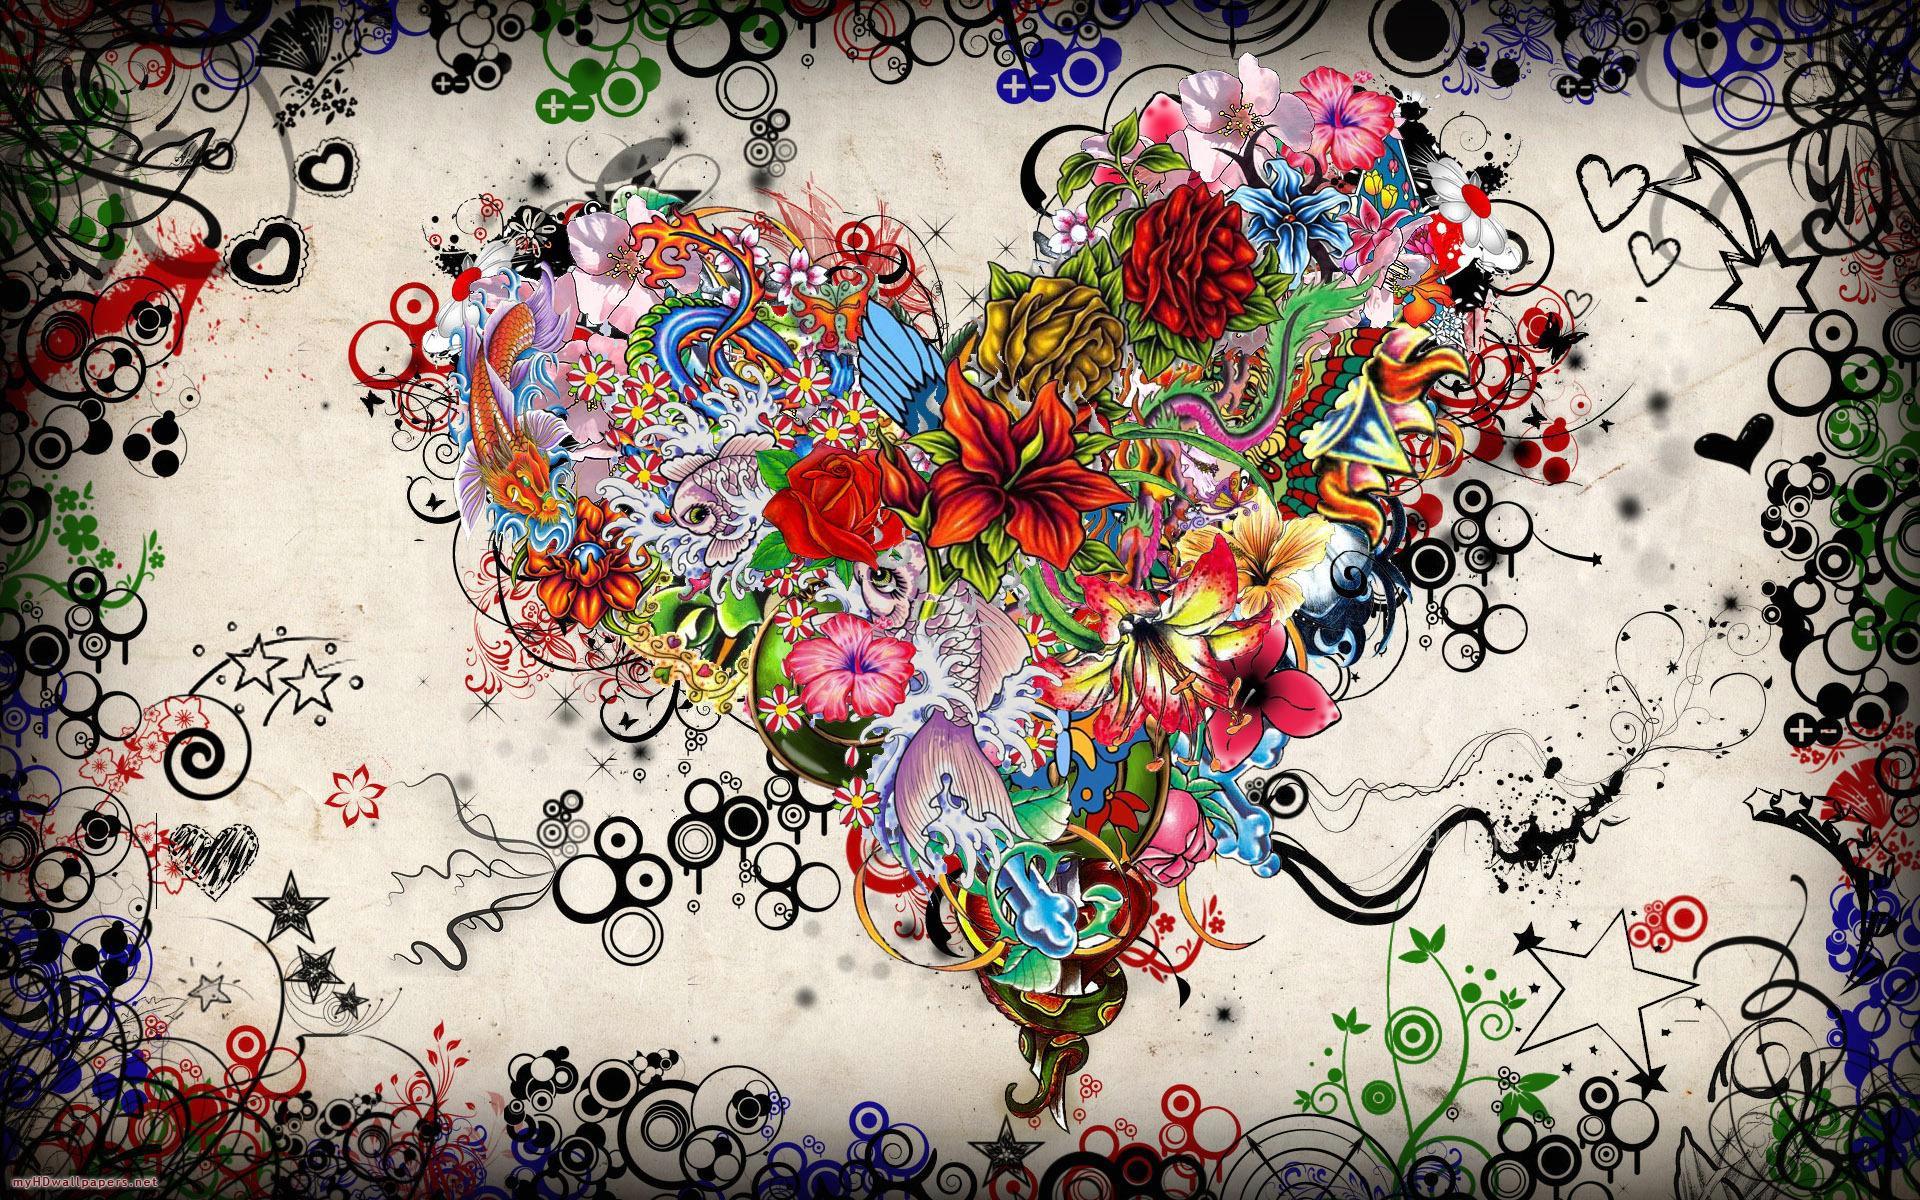 Flower colorful heart   Desktop Wallpaper HD Wallpapers Download 1920x1200